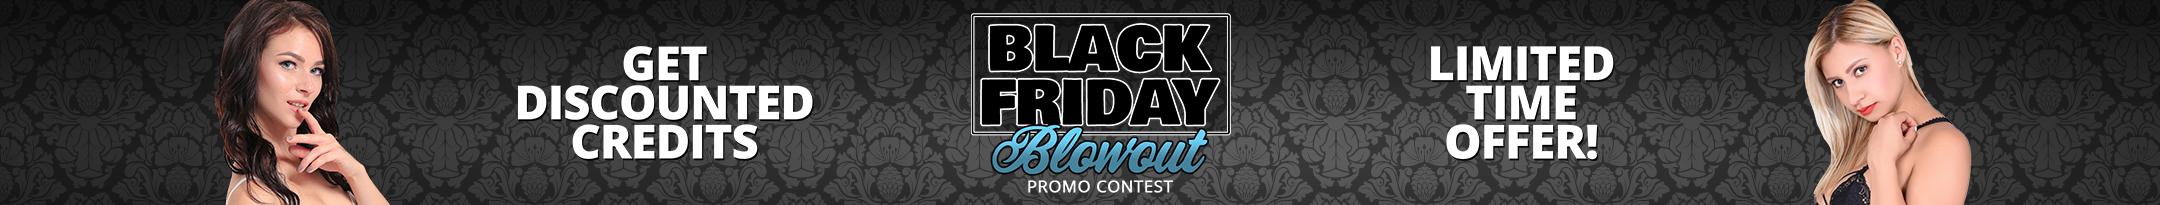 Black Friday BLOWOUT Promo